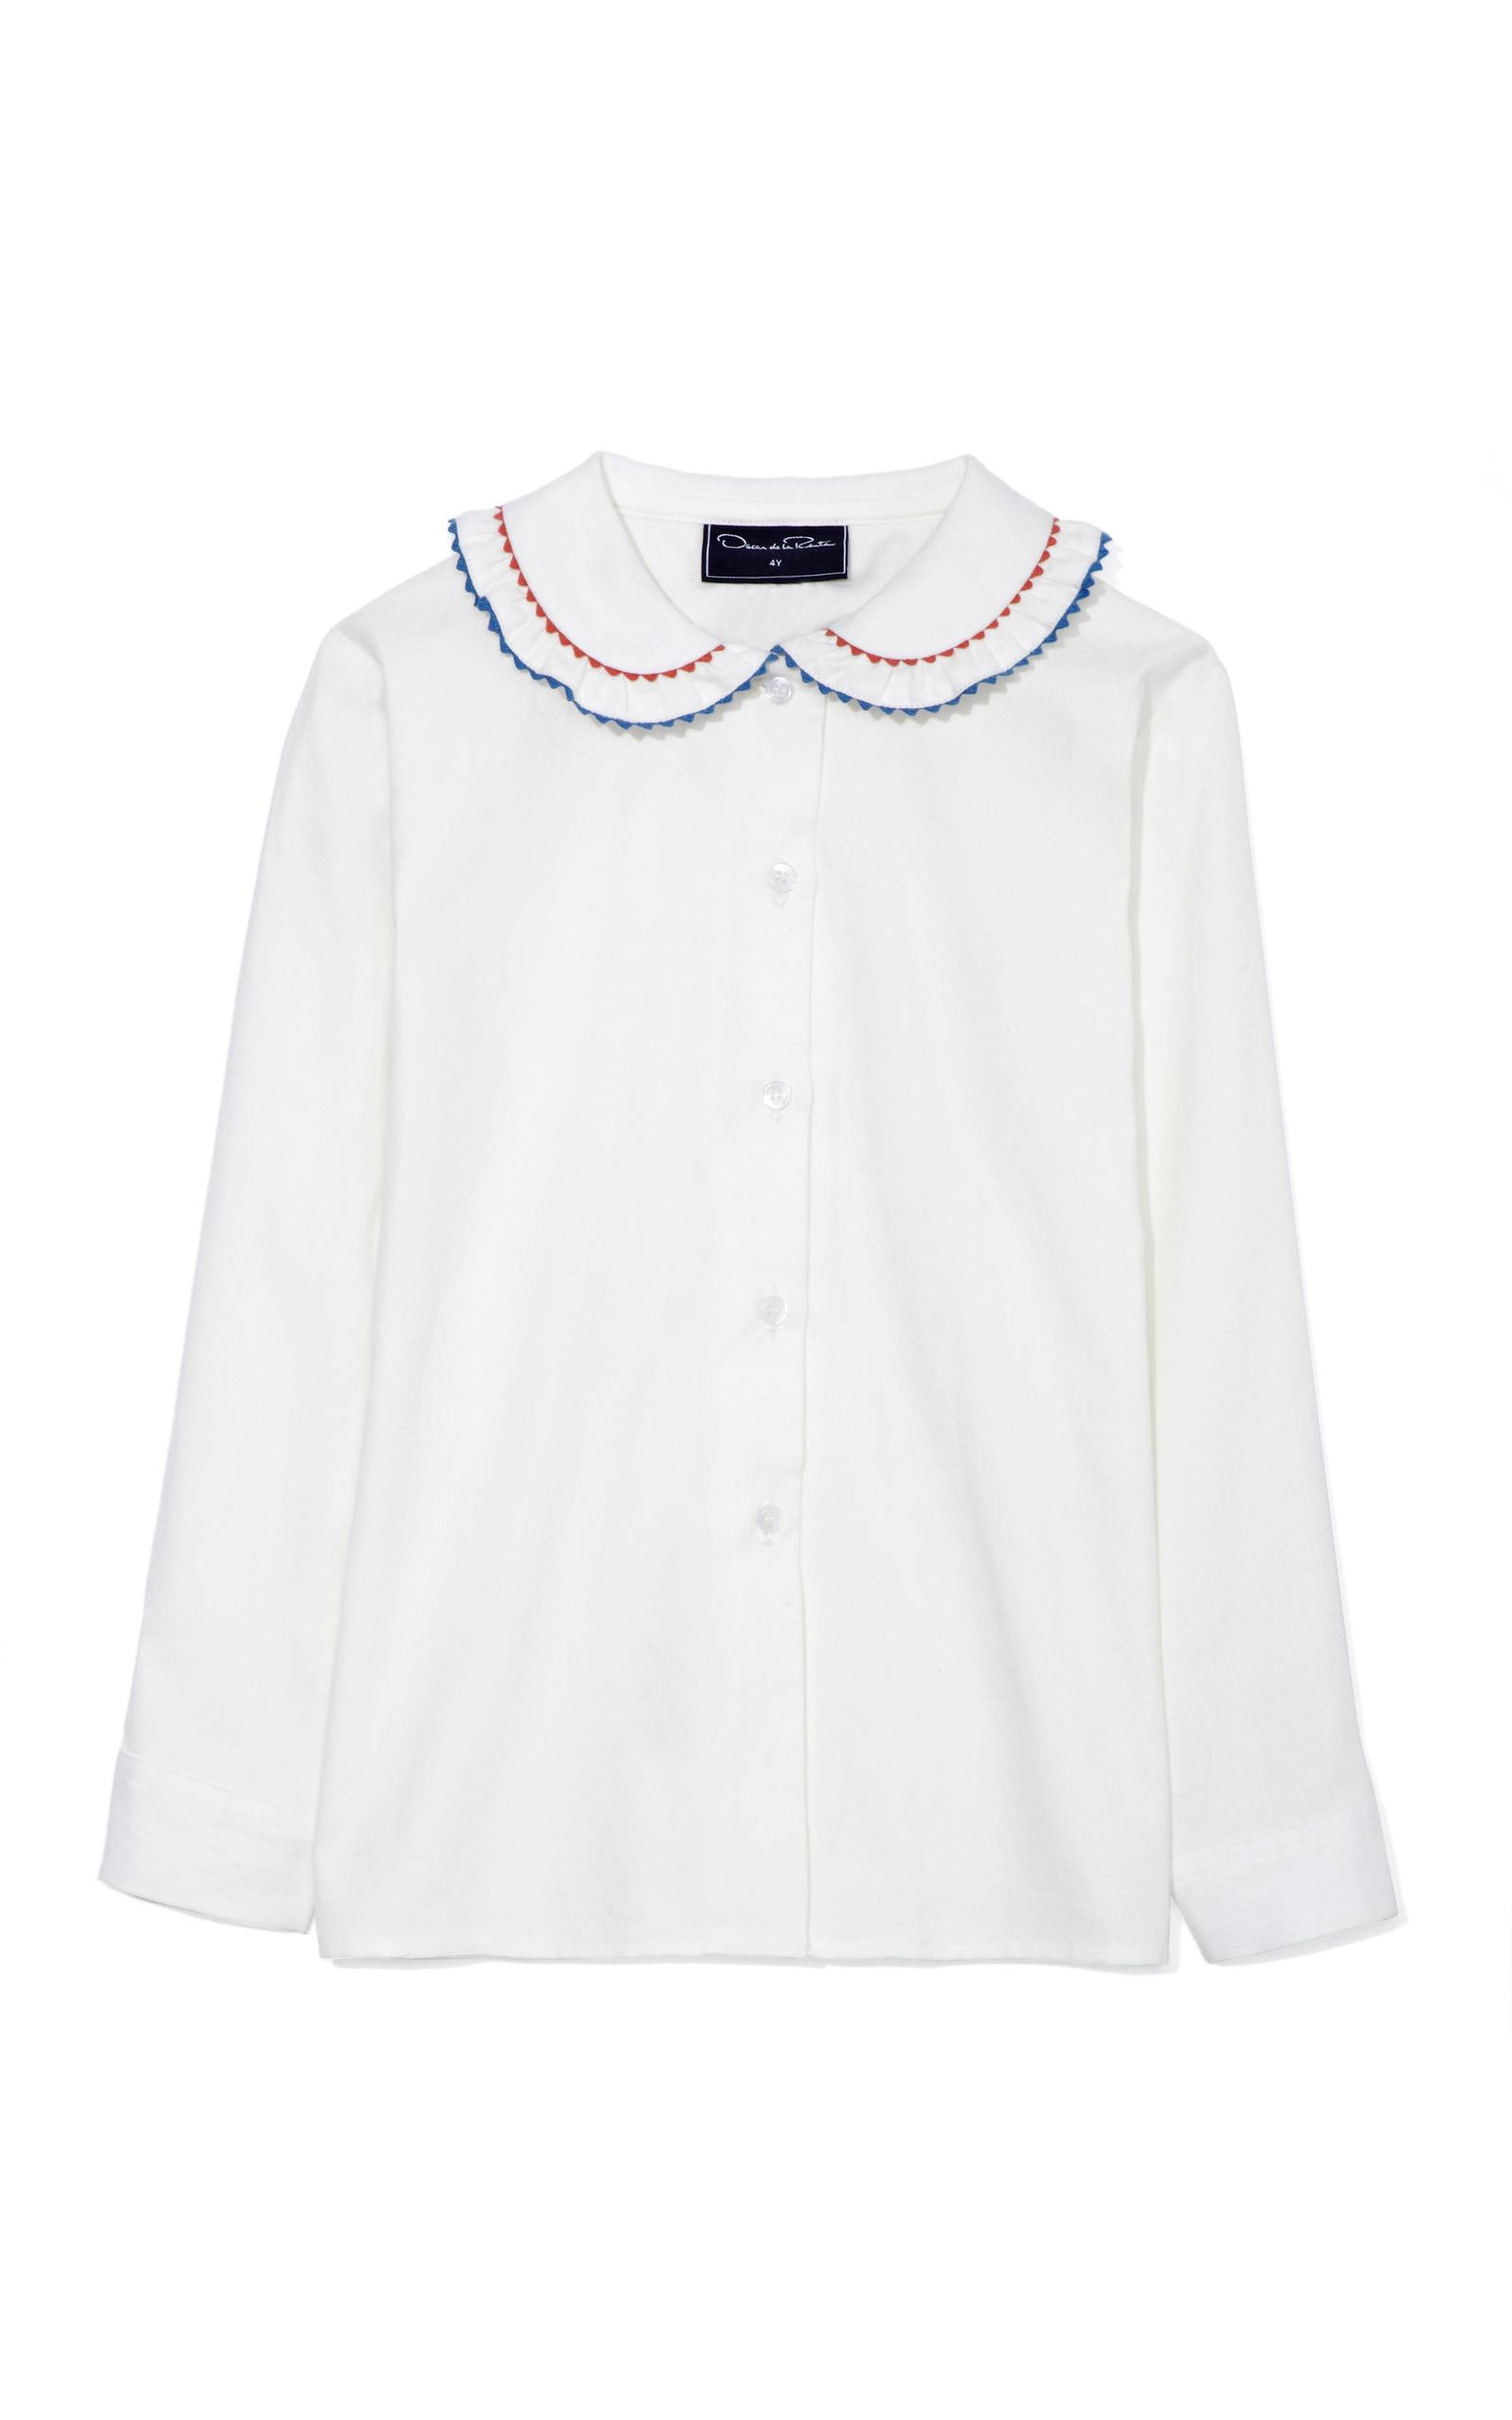 French cuff blouse - White Oscar De La Renta Visit New Online Latest Collections Pick A Best AsDUs